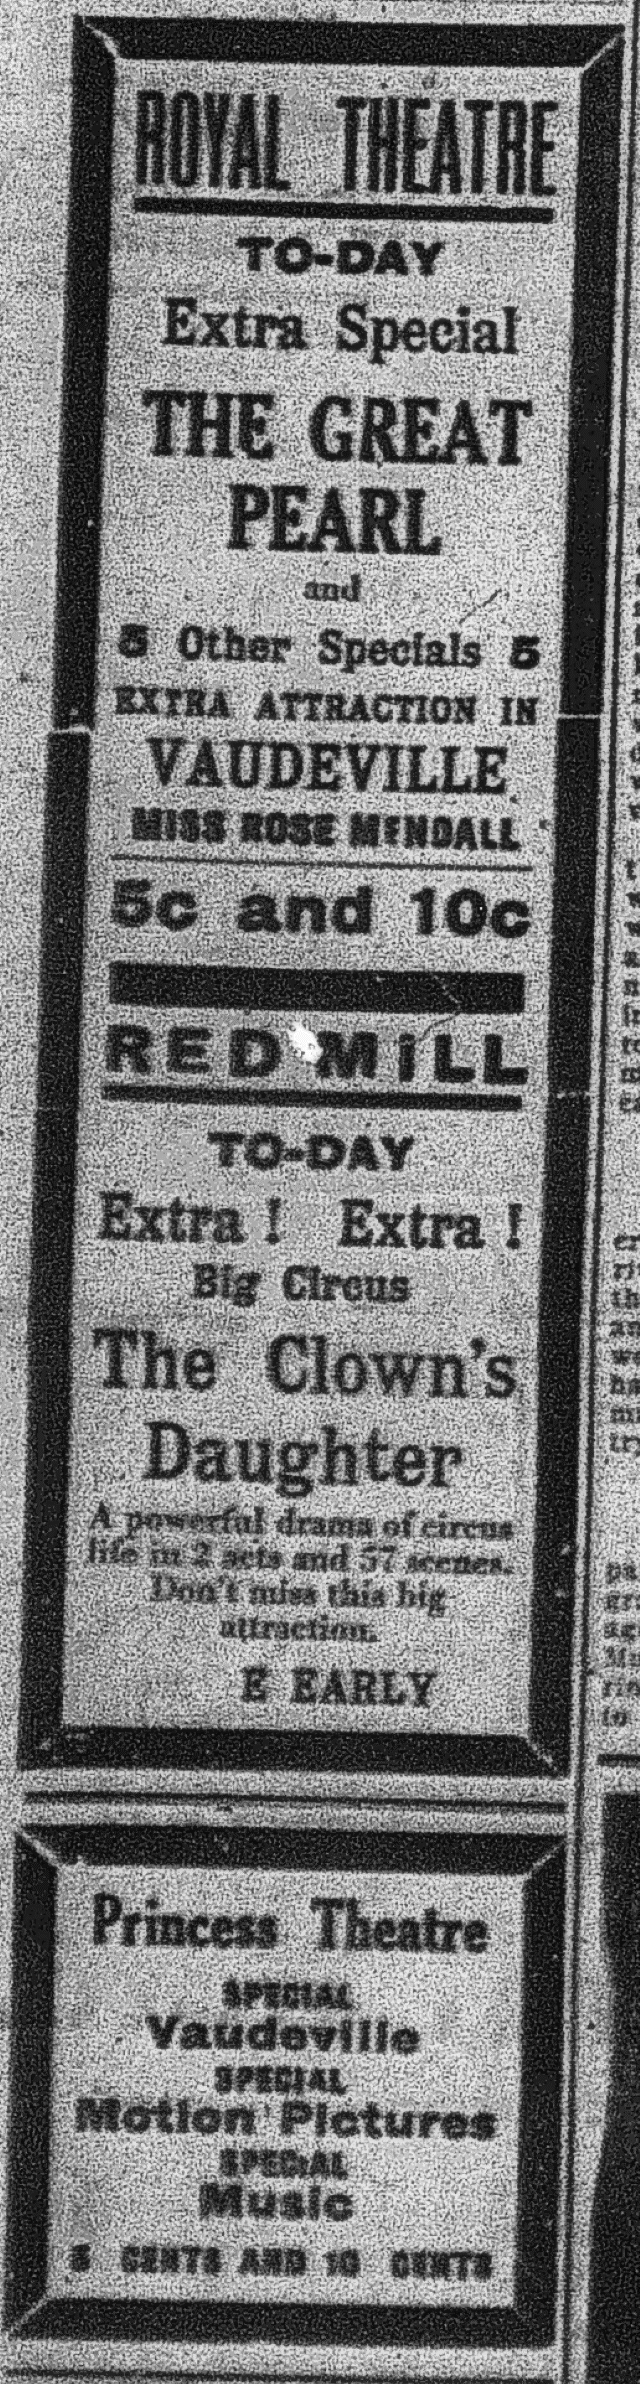 Examiner , Dec. 9, 1913.